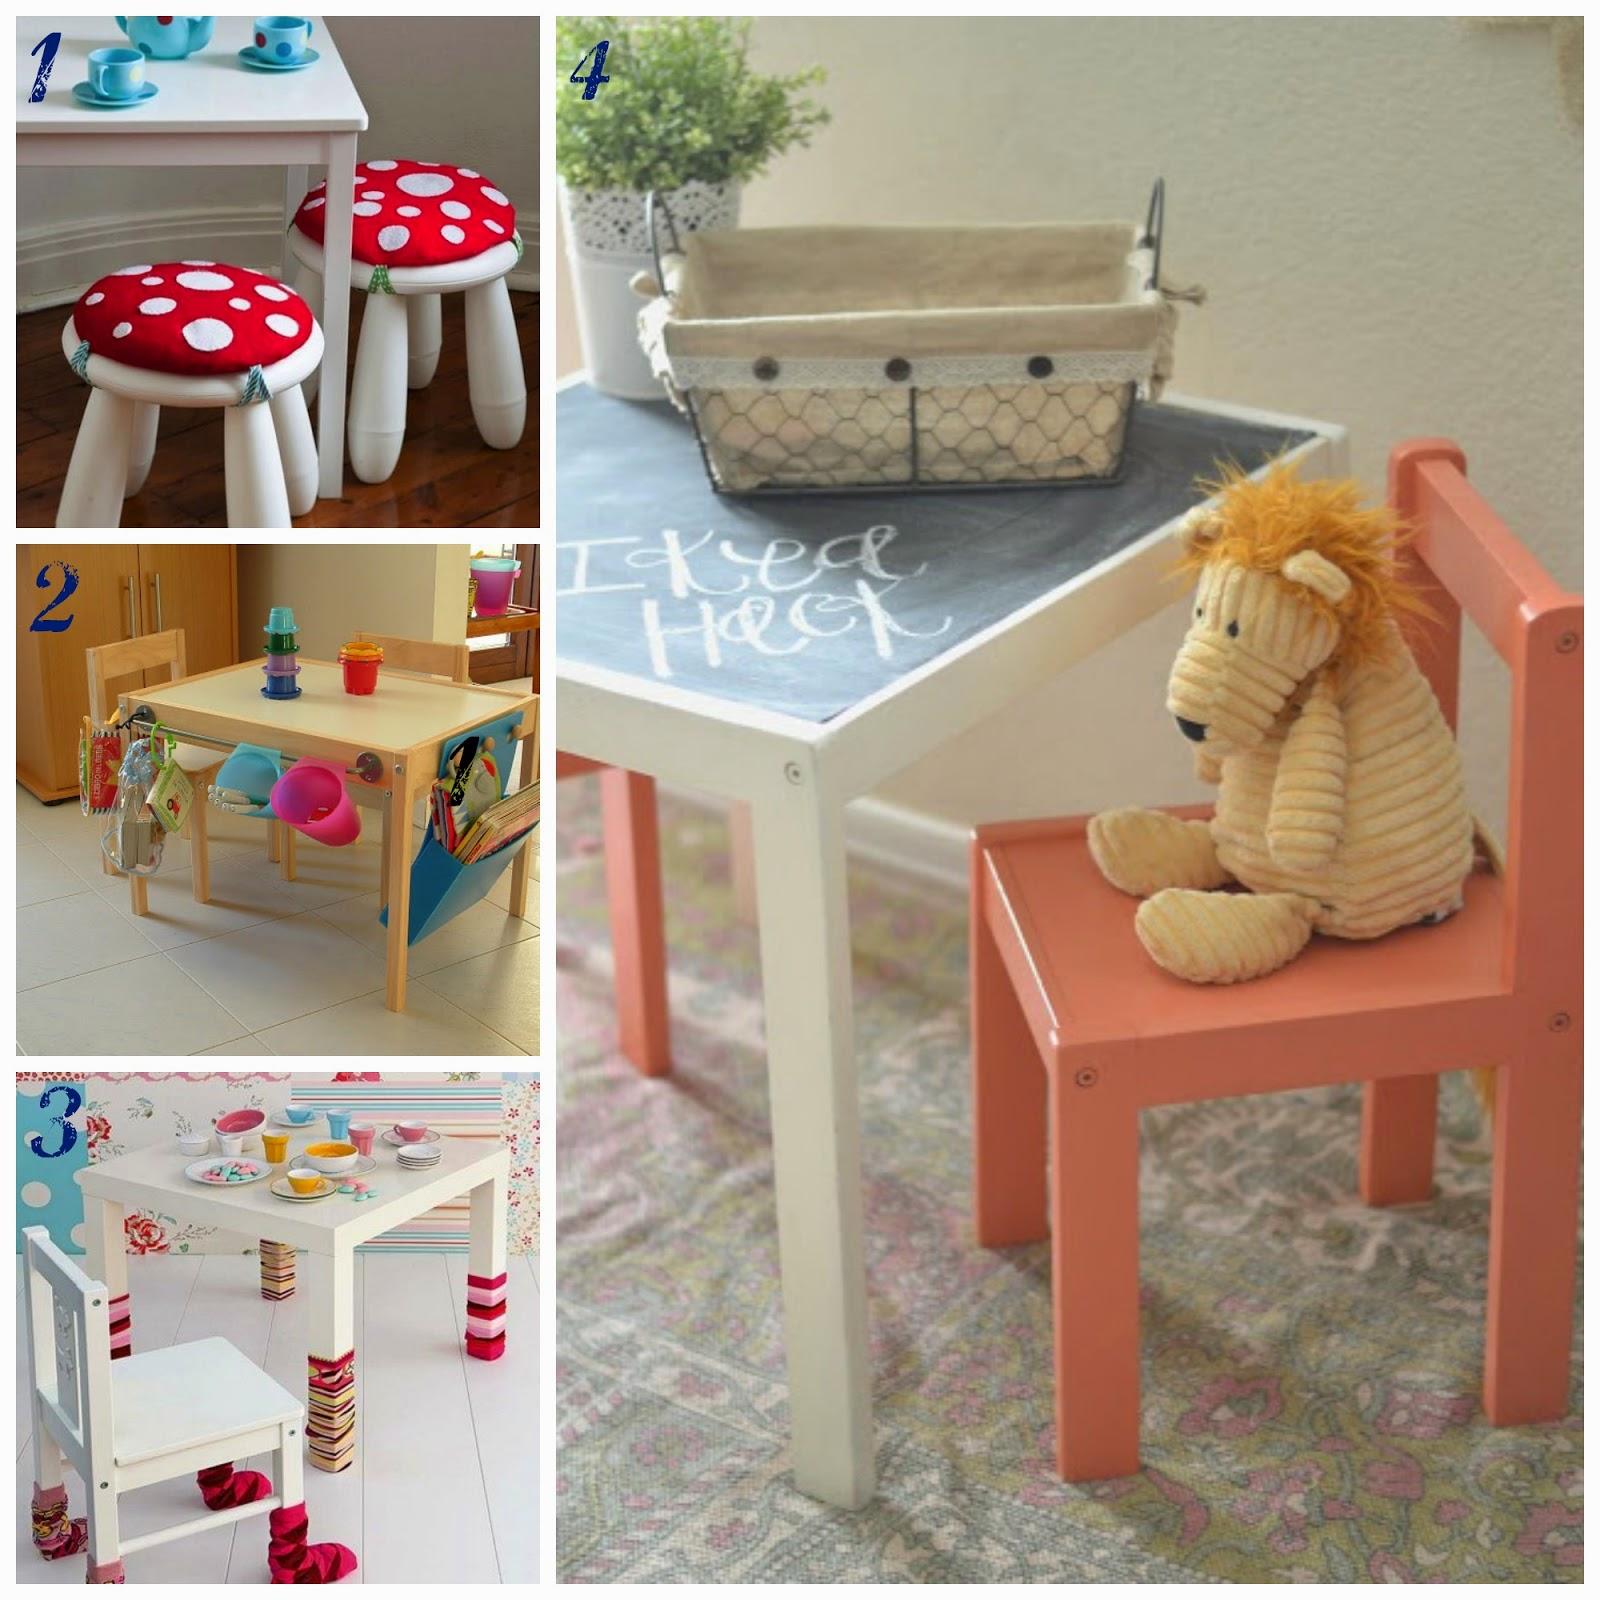 Ikea Guardaroba Per Bambini.Guardaroba Ikea Bimbi Castelli Scorrevoli Camerette Per Ragazzi